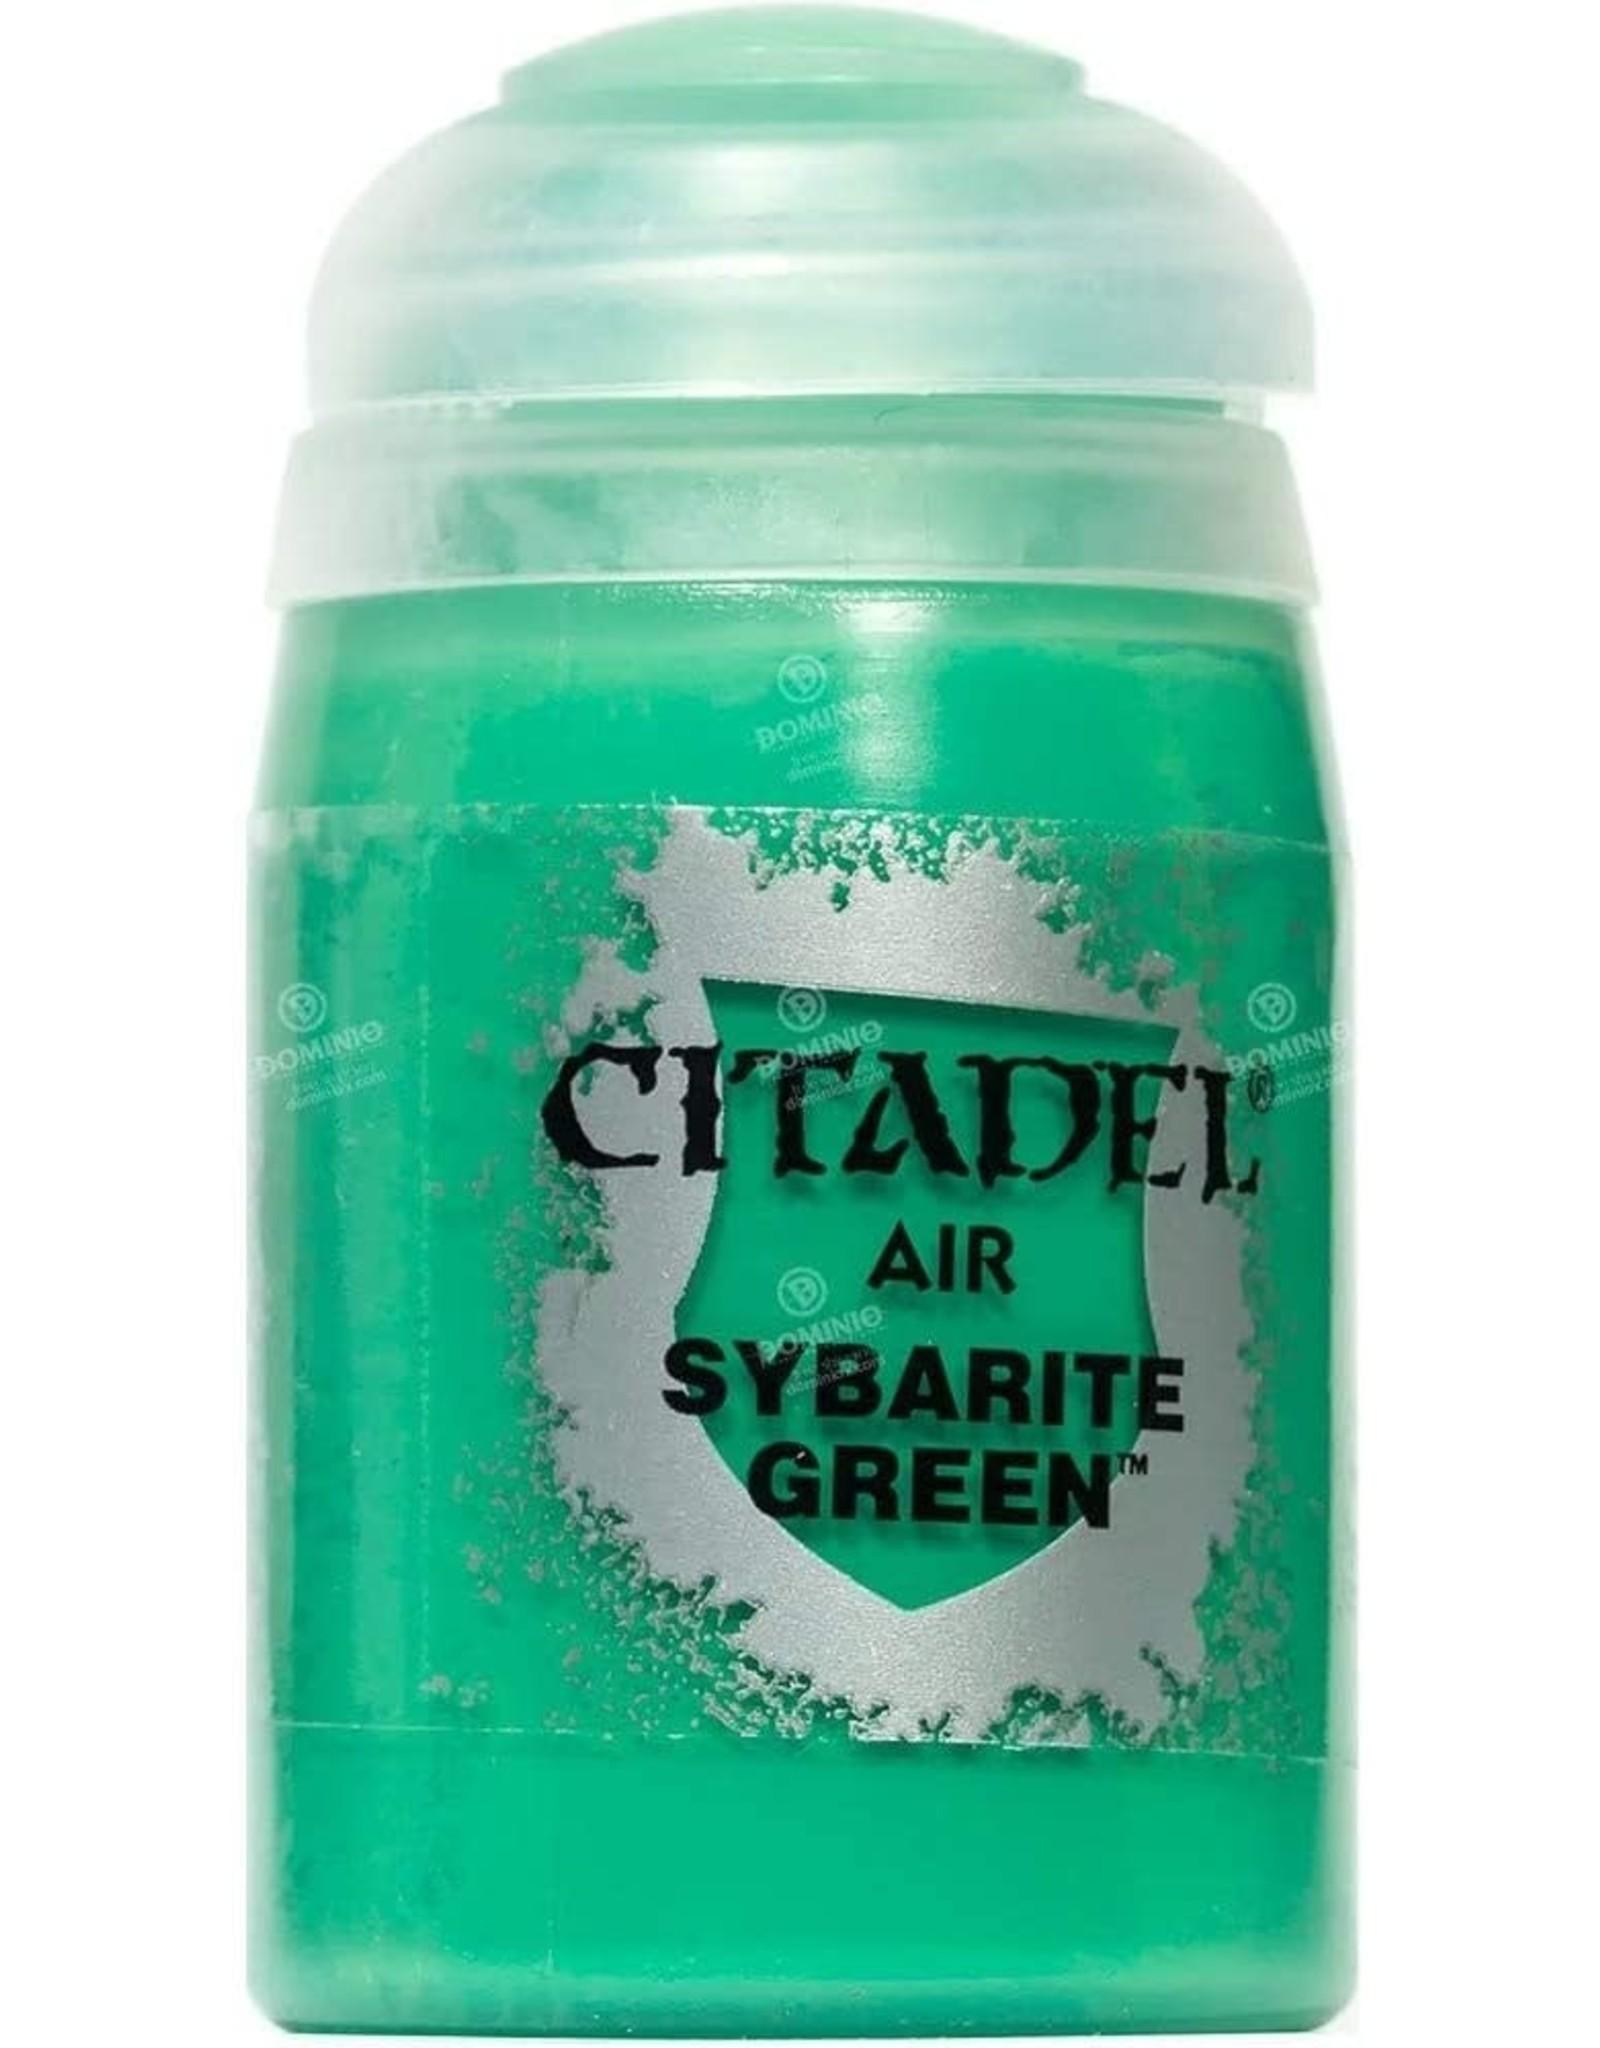 Games Workshop Citadel Paint: Sybarite Green Air (24 ml)